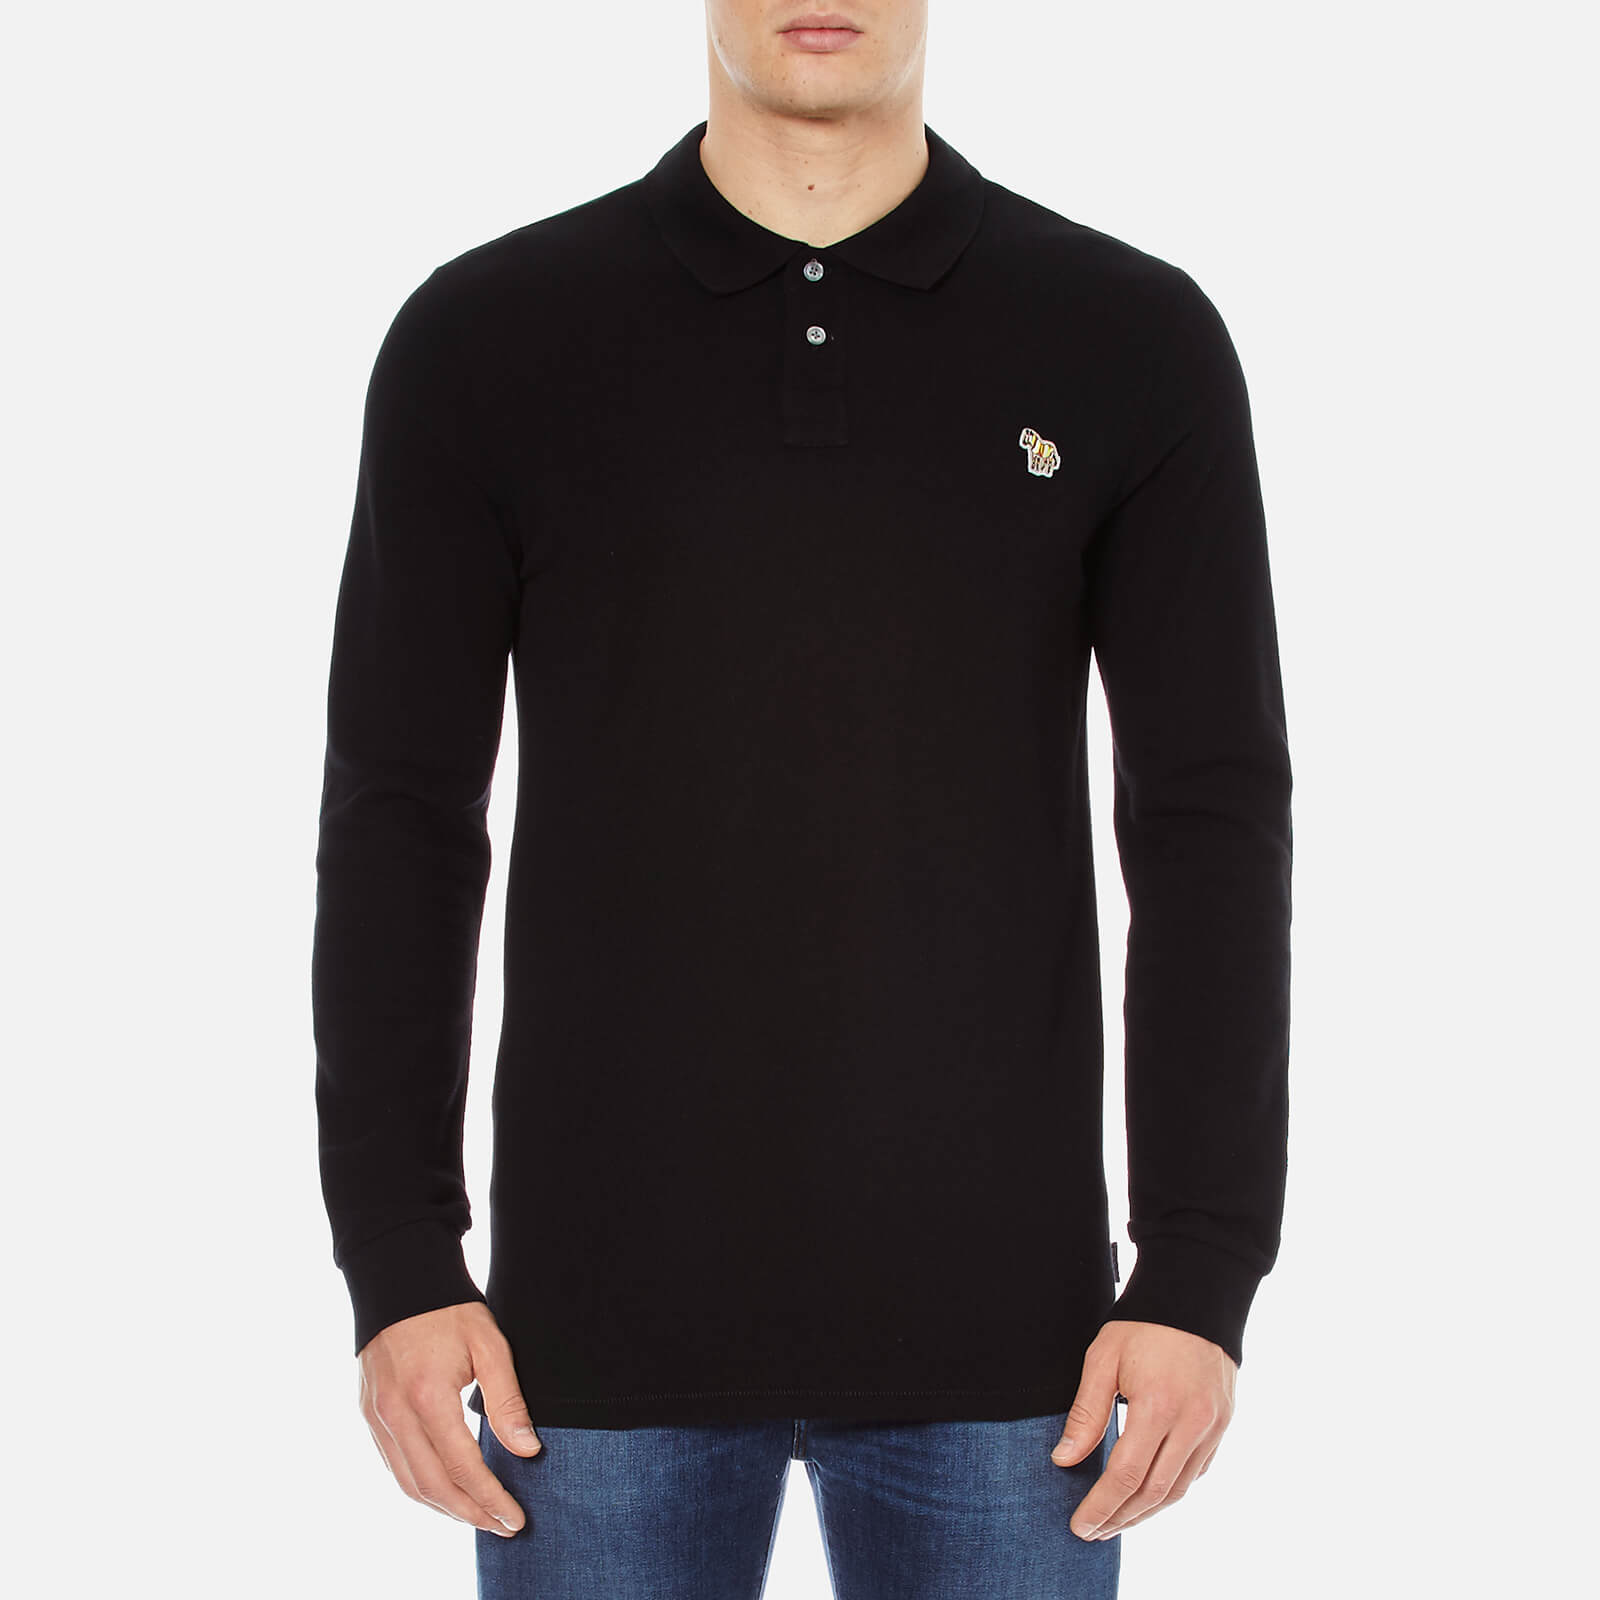 fbde6ec64 PS Paul Smith Men's Basic Long Sleeve Pique Zebra Polo Shirt - Black - Free  UK Delivery over £50